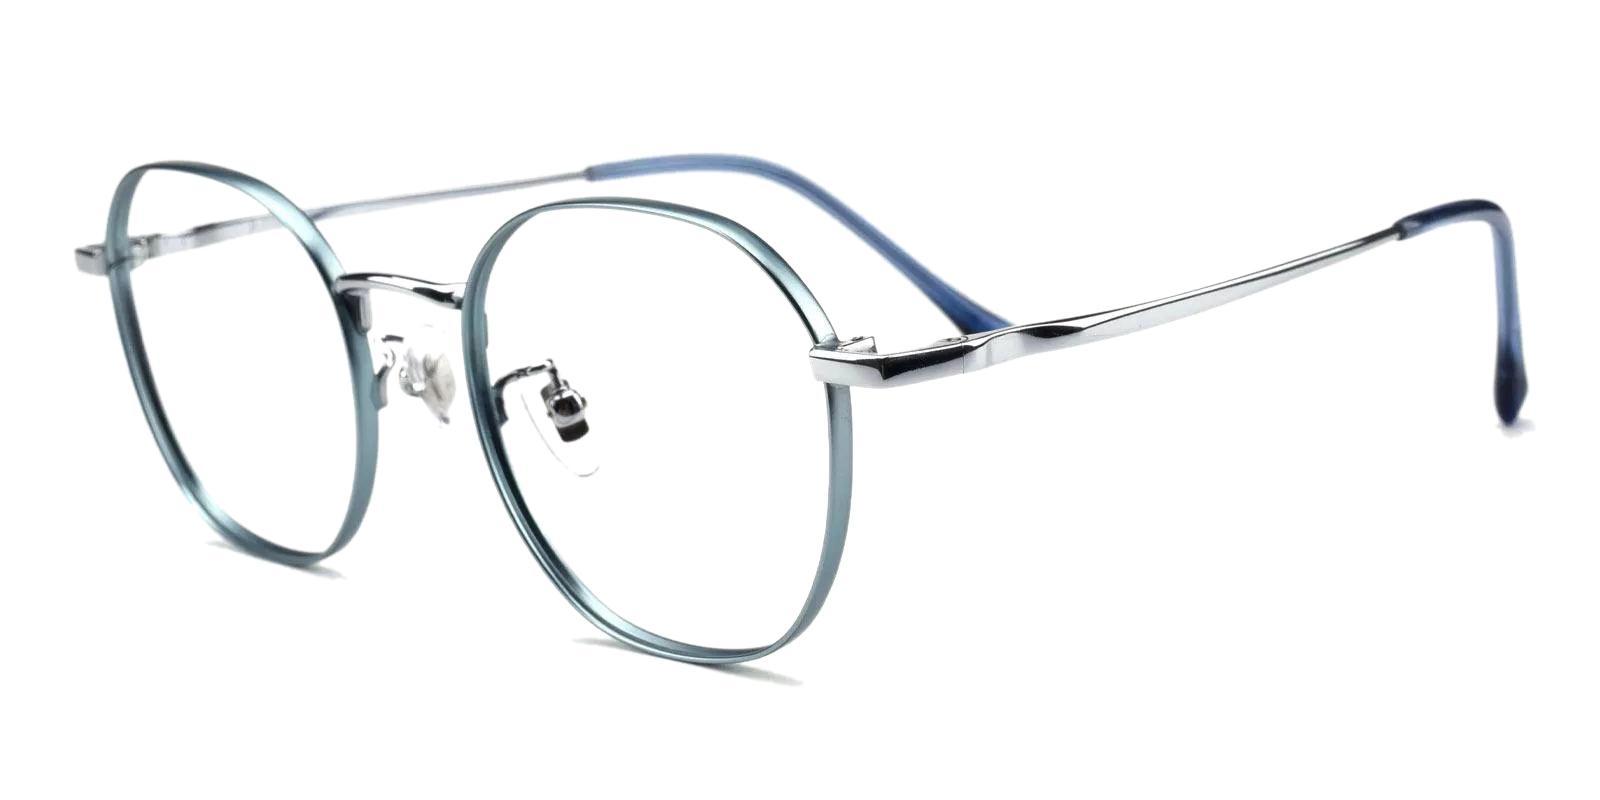 Community Blue Metal Eyeglasses , Fashion , NosePads Frames from ABBE Glasses